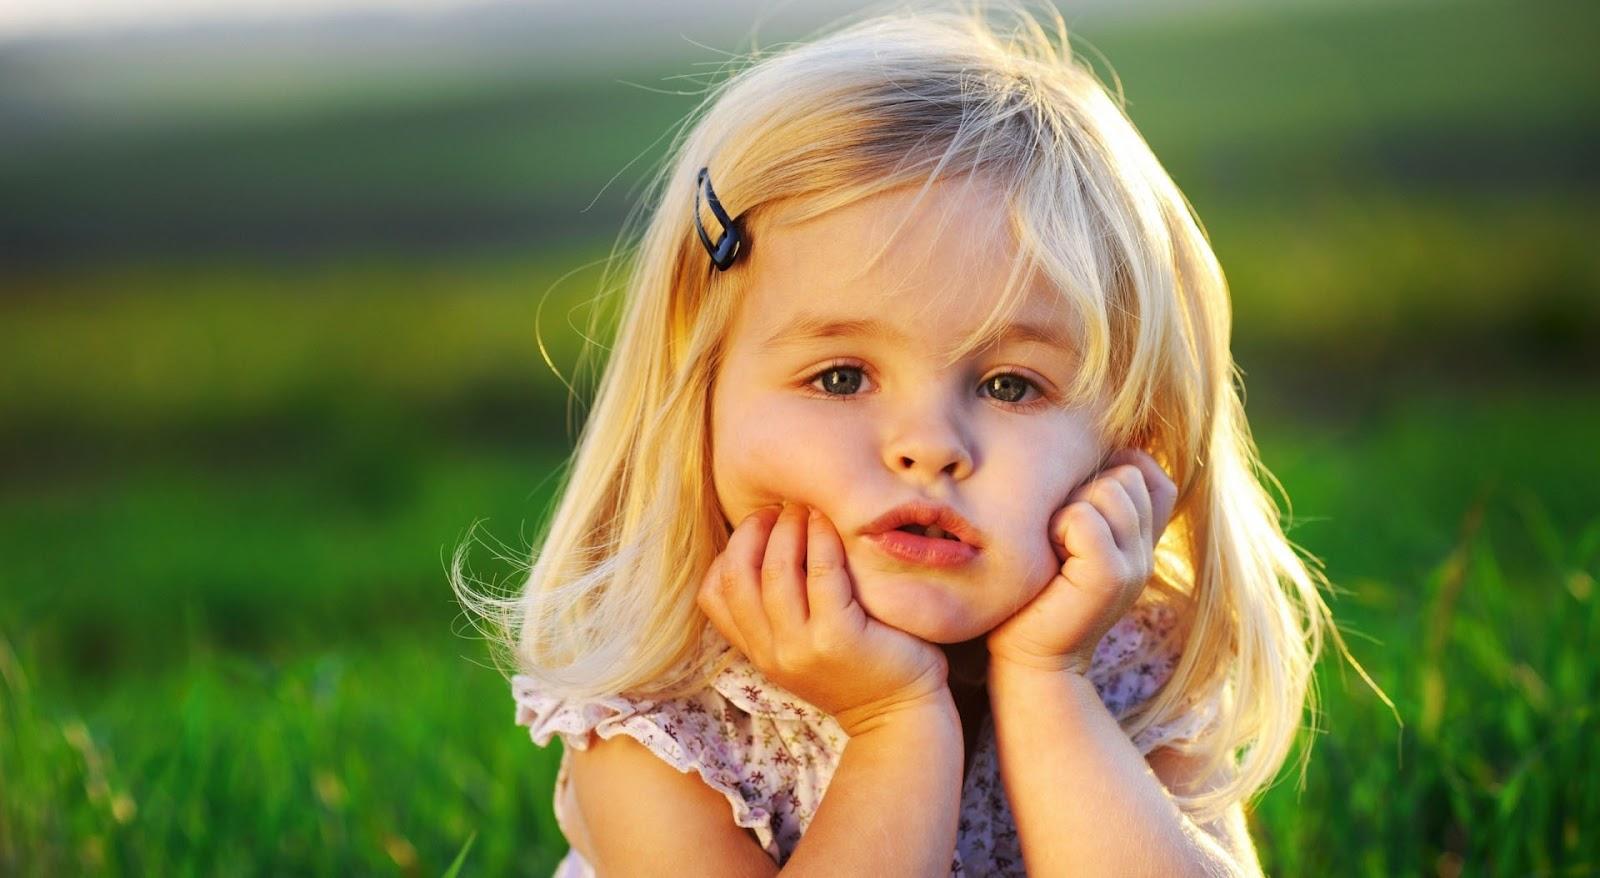 http://1.bp.blogspot.com/-U5cperFbxmM/UEssmlMHEsI/AAAAAAAABWY/GUcuGyOpm6w/s1600/cute_baby_girl-wallpaper-1920x1080.jpg